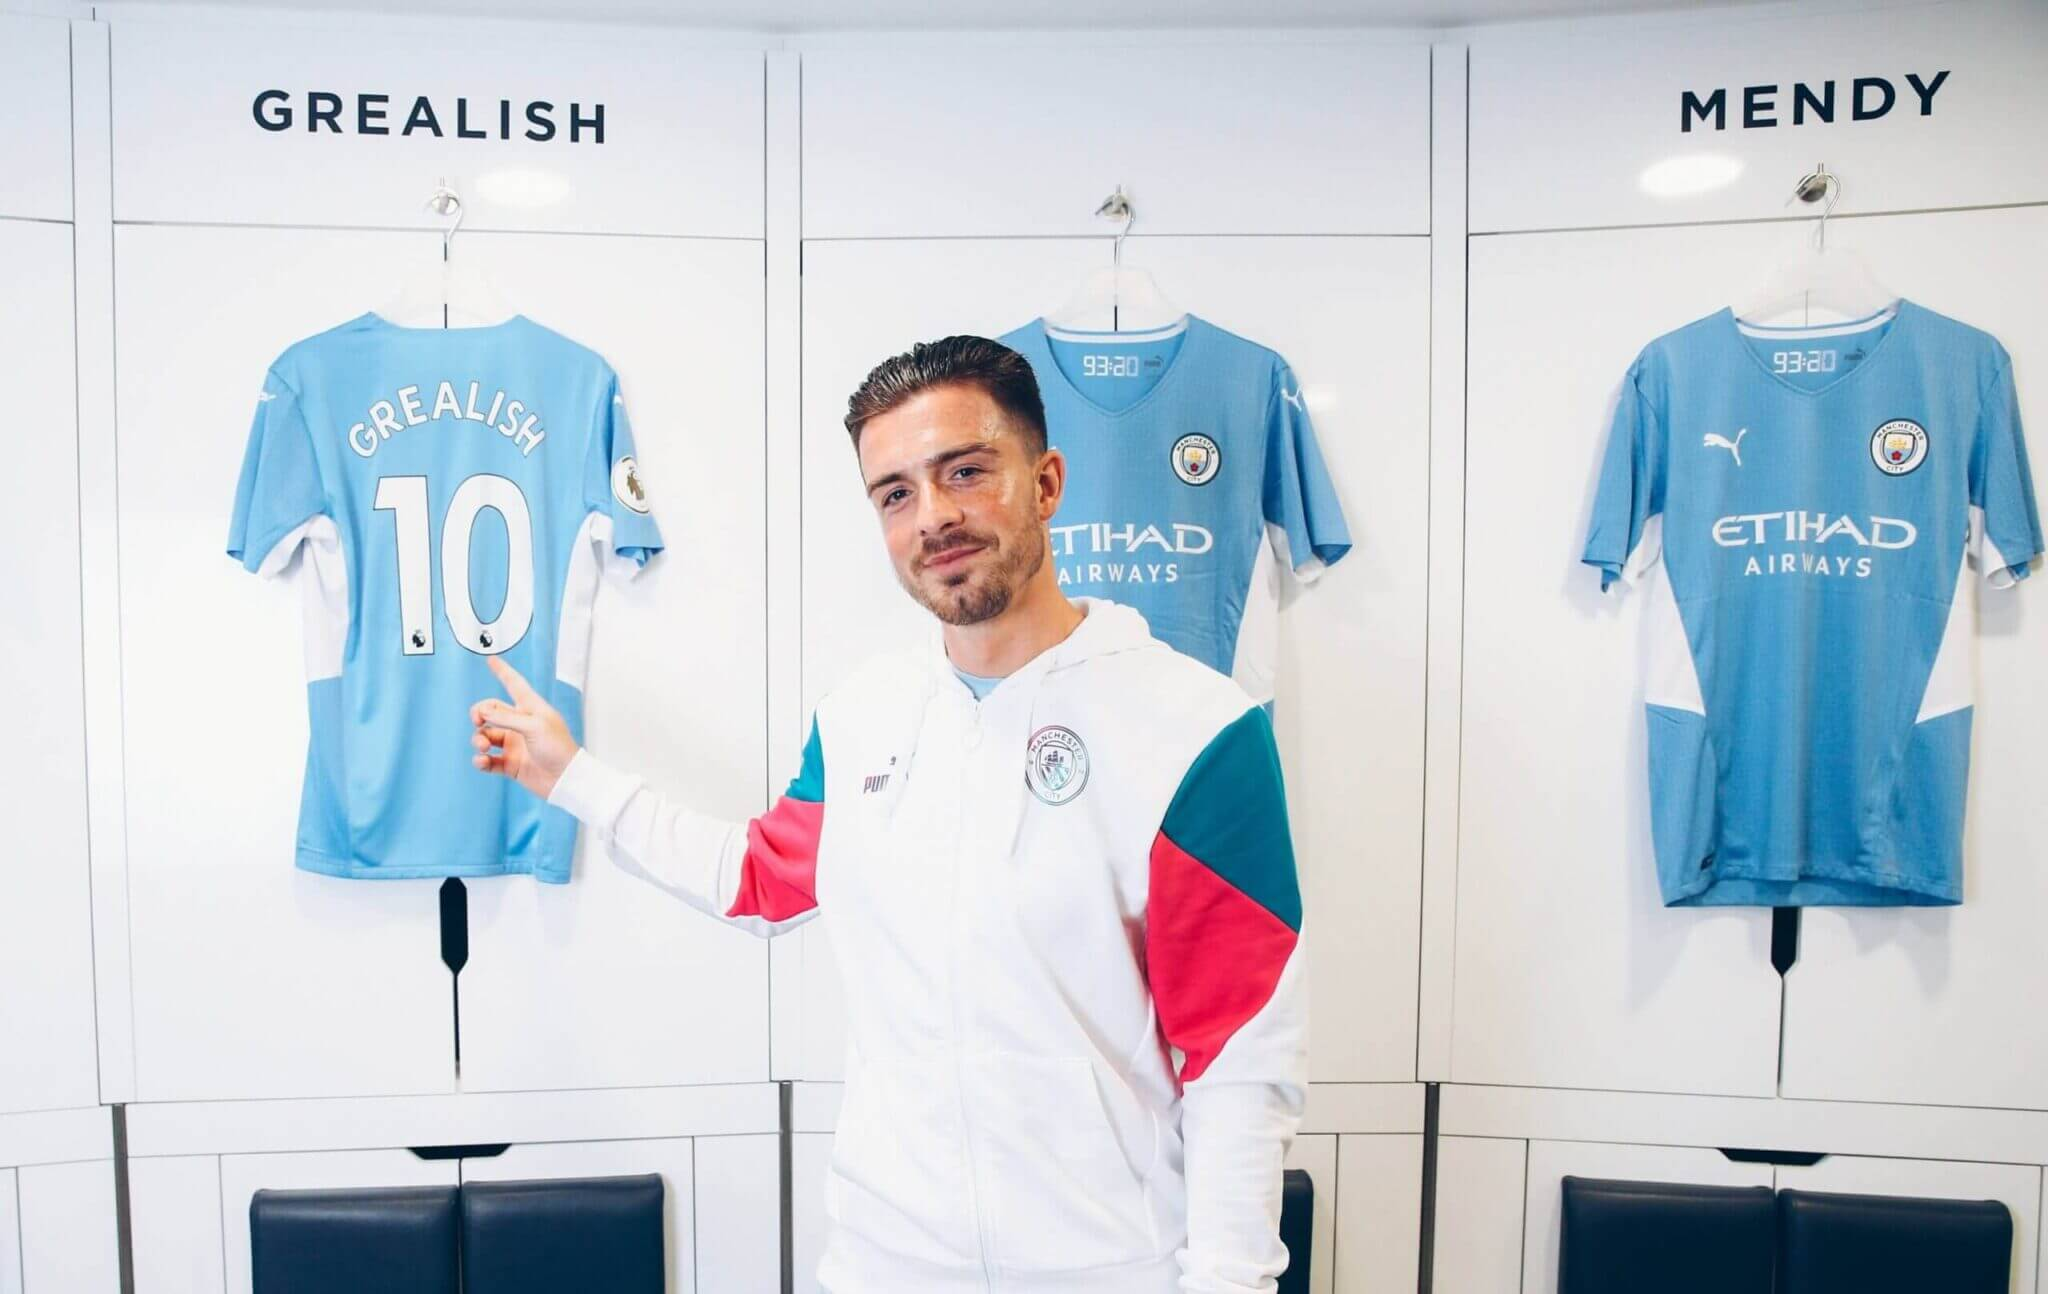 Grealish khiến Man City tiêu tốn tới 100 triệu bảng